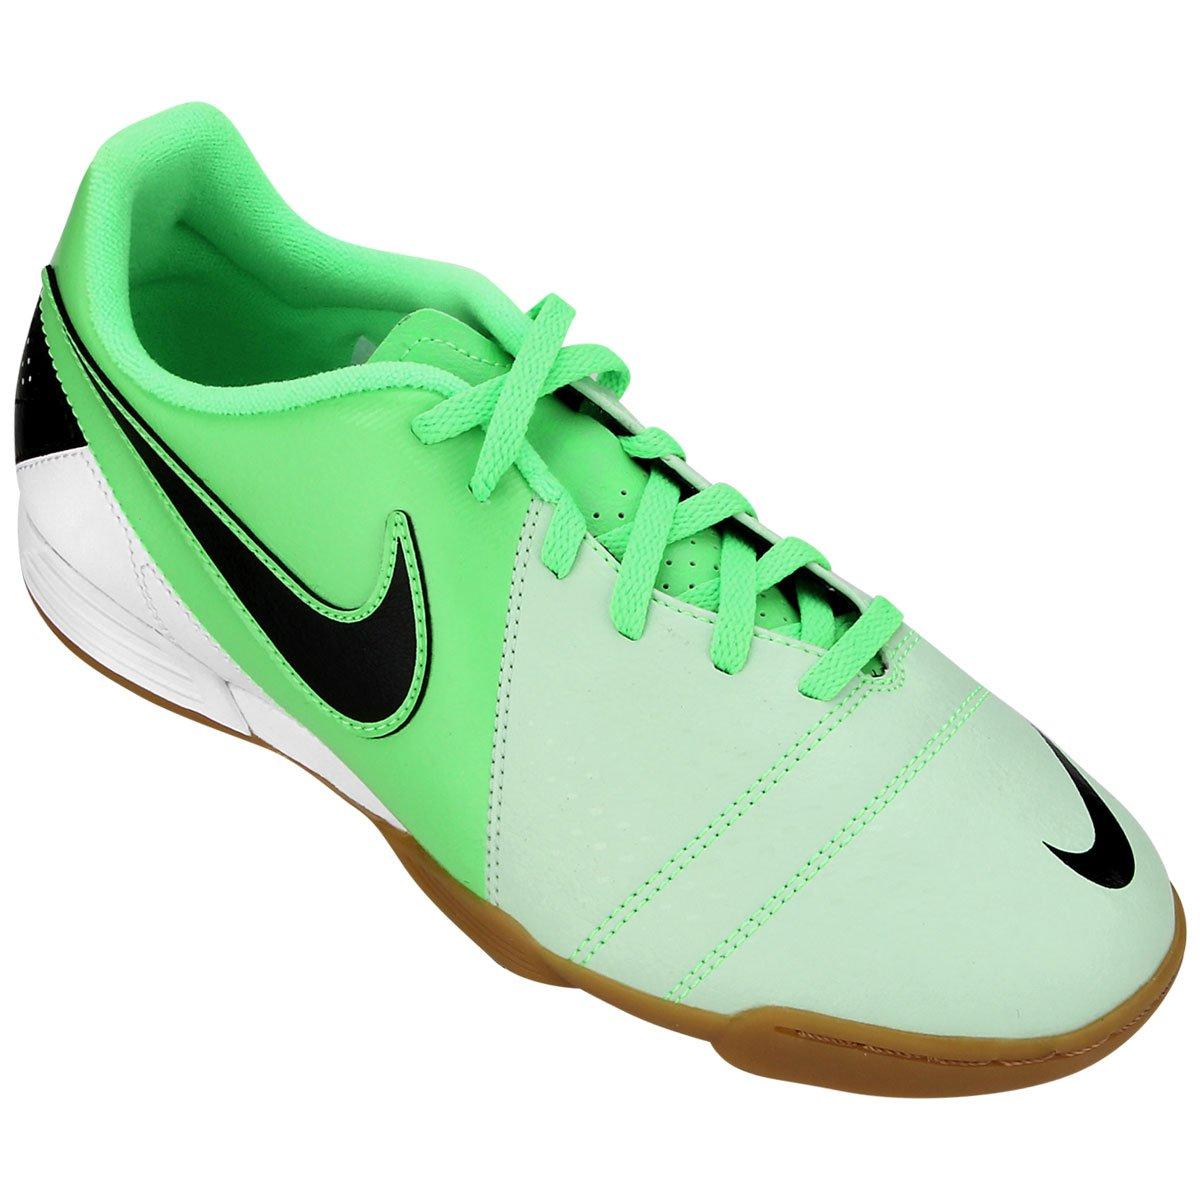 Chuteira Nike CTR360 Enganche 3 IC - Compre Agora  0fd0742f43c83